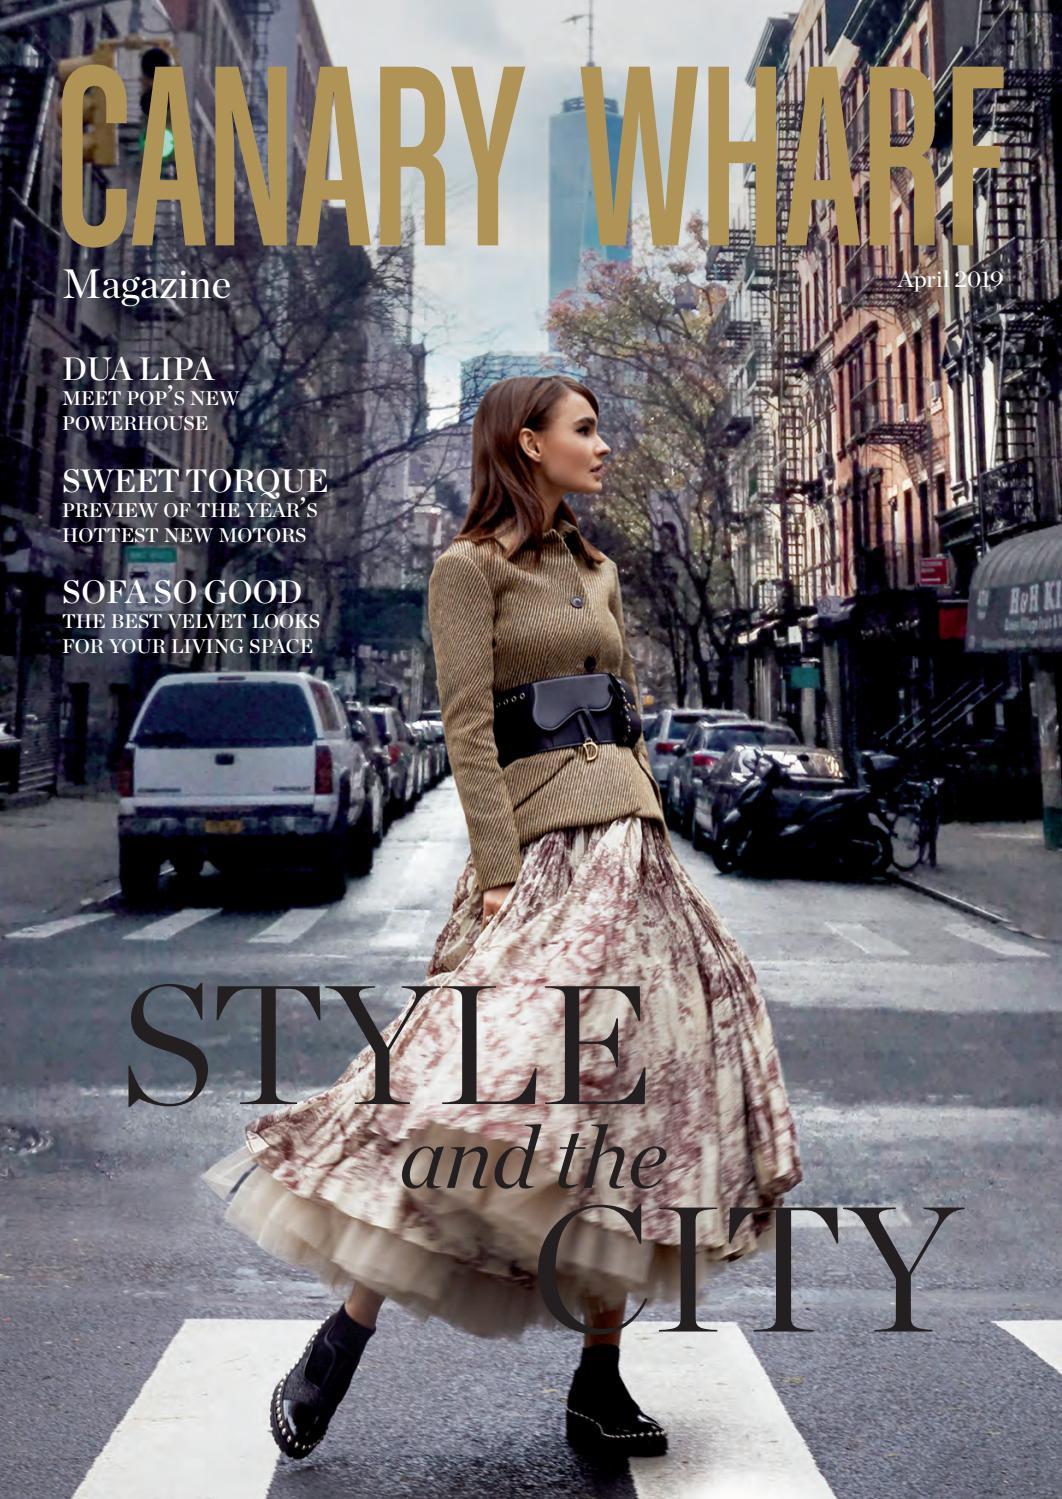 eaa8ddb24 Canary Wharf Magazine April 2019 by Luxury London Media - issuu